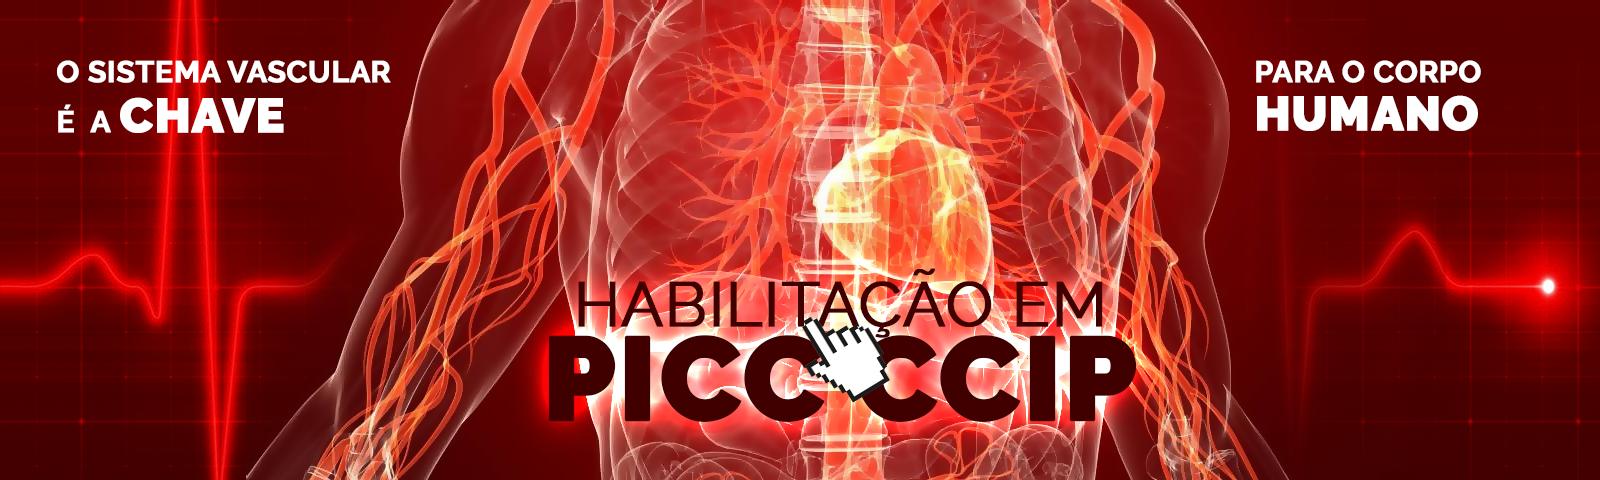 picc-slider